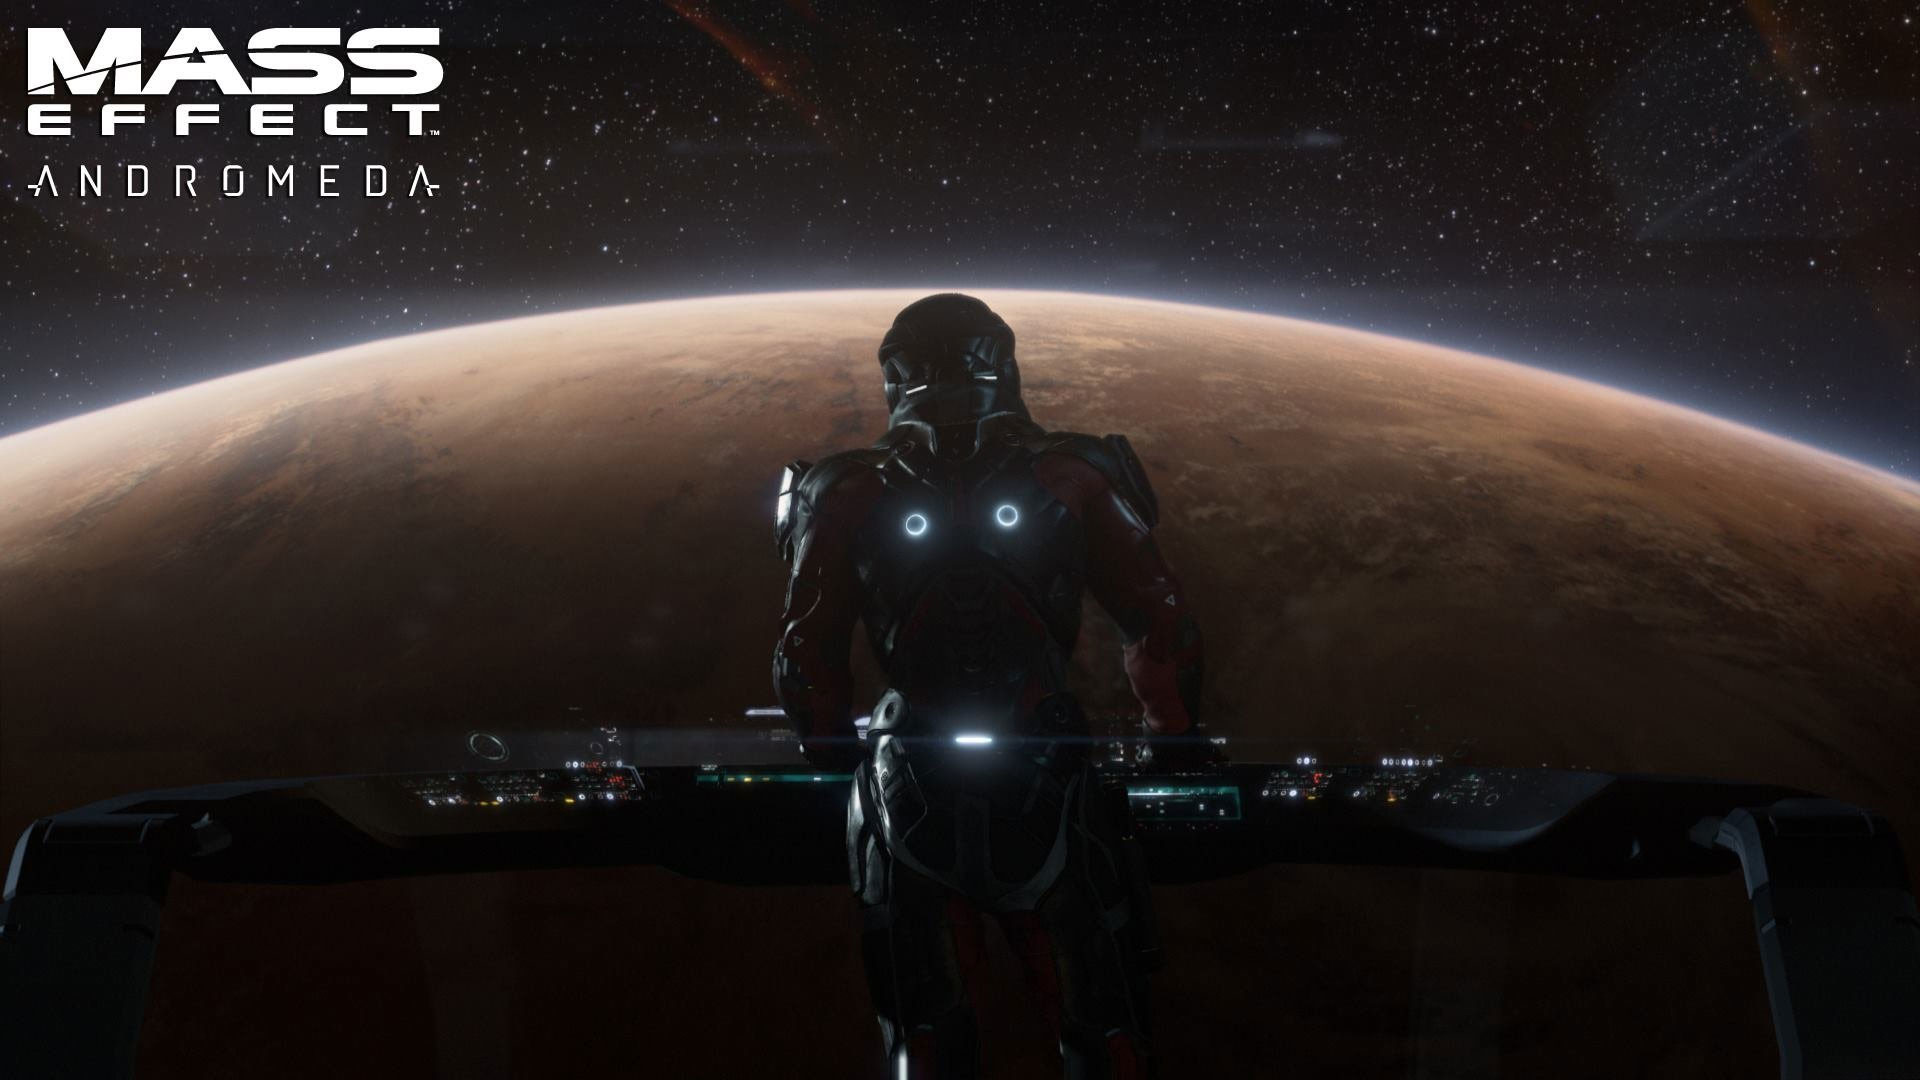 Mass Effect Andromeda 4K Wallpaper | Mass Effect Andromeda 1080p Wallpaper  …